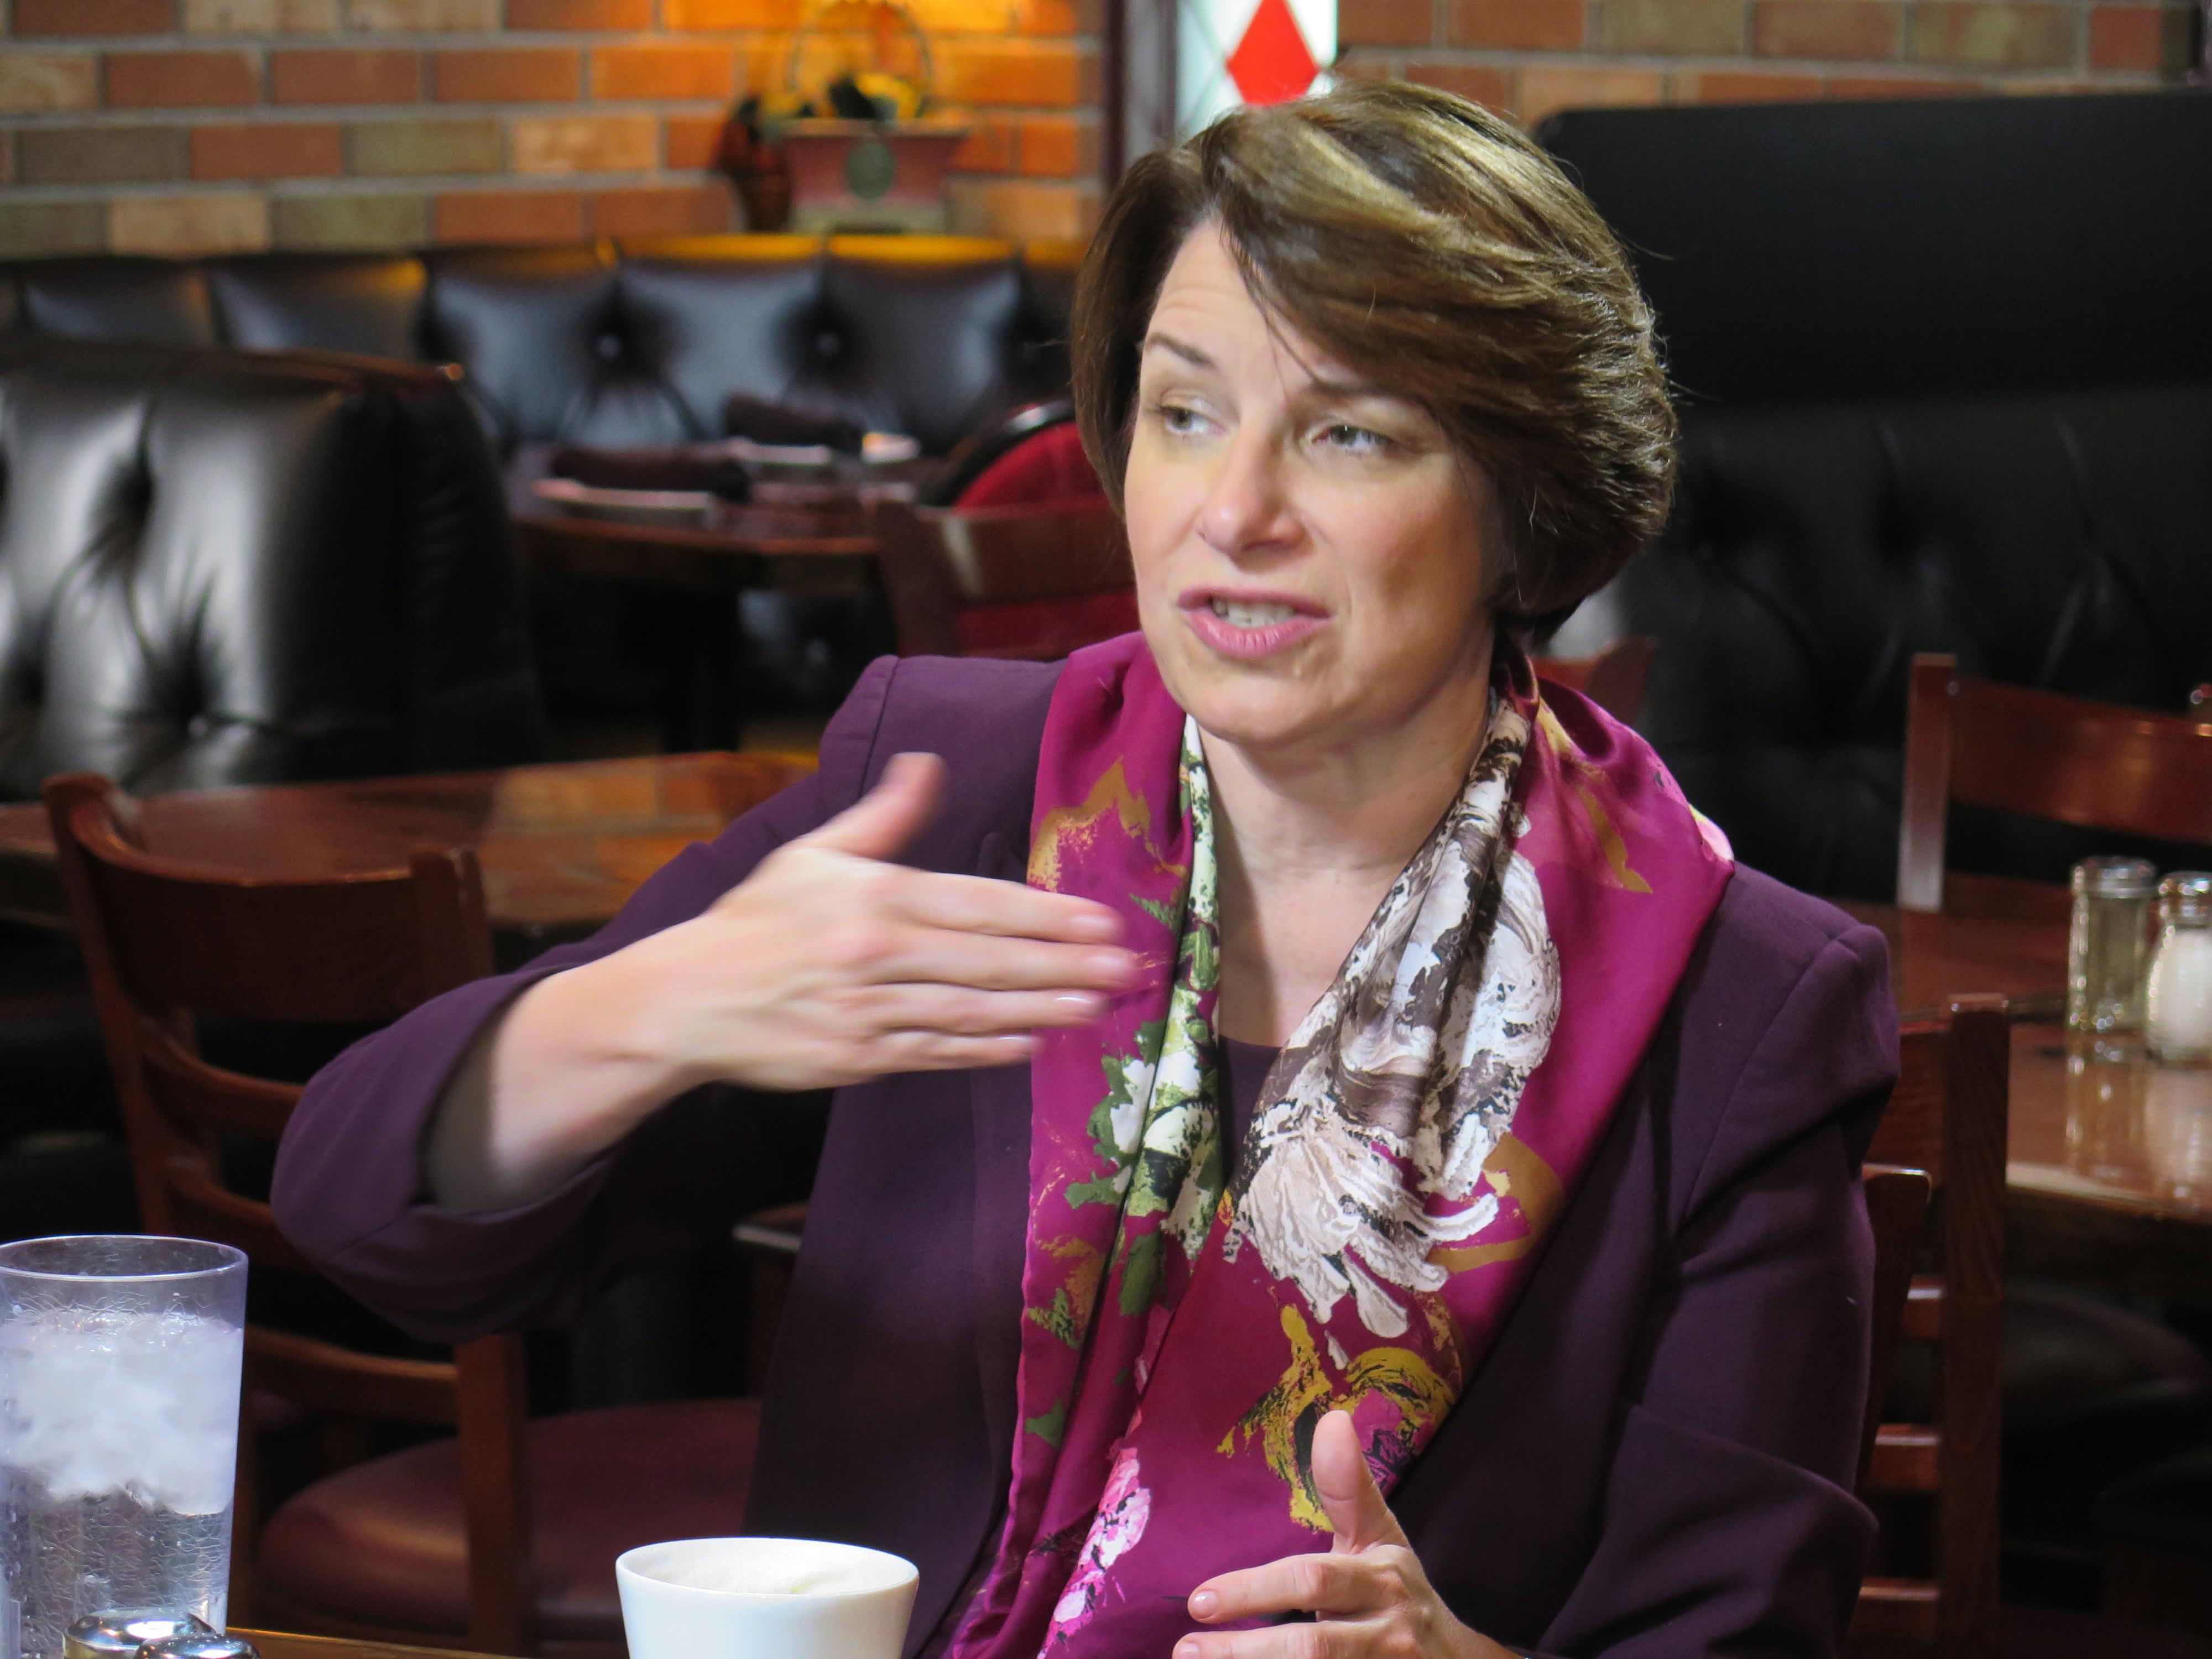 2020 Democrat Amy Klobuchar: The American economy needs 'rebalancing'